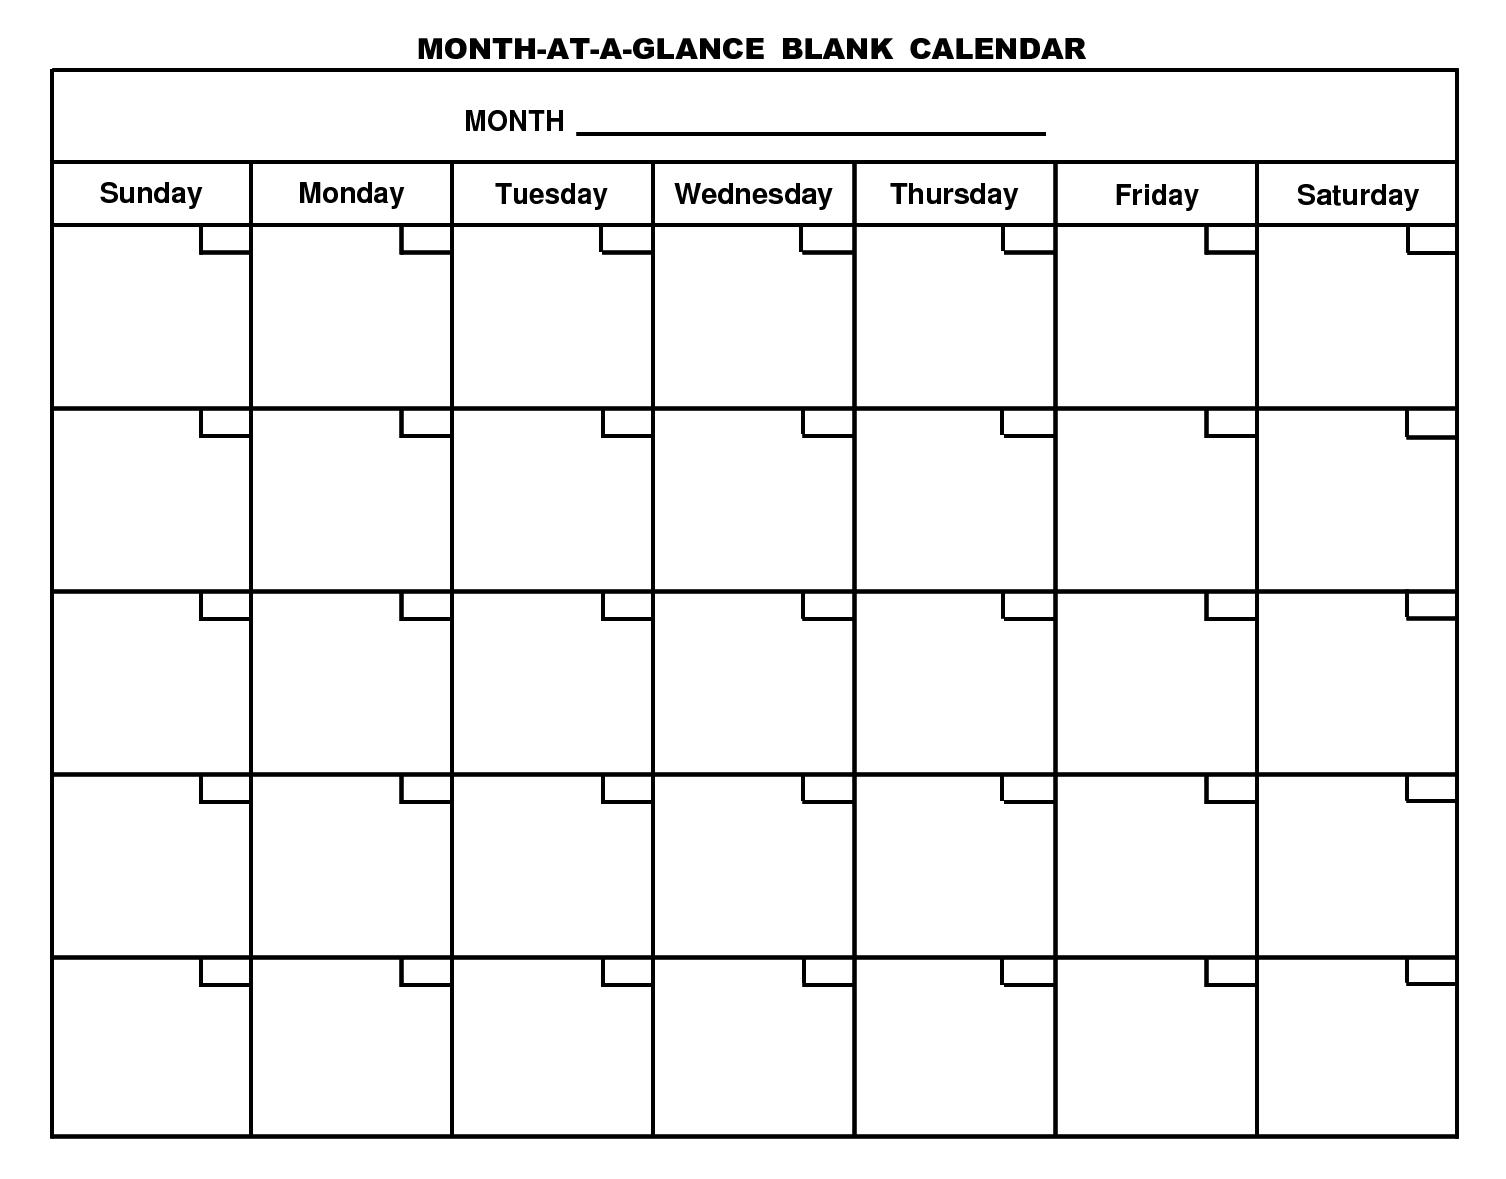 Printable Blank Year Calendar 2013 | Vertical Monthly Free Fill In Calendar